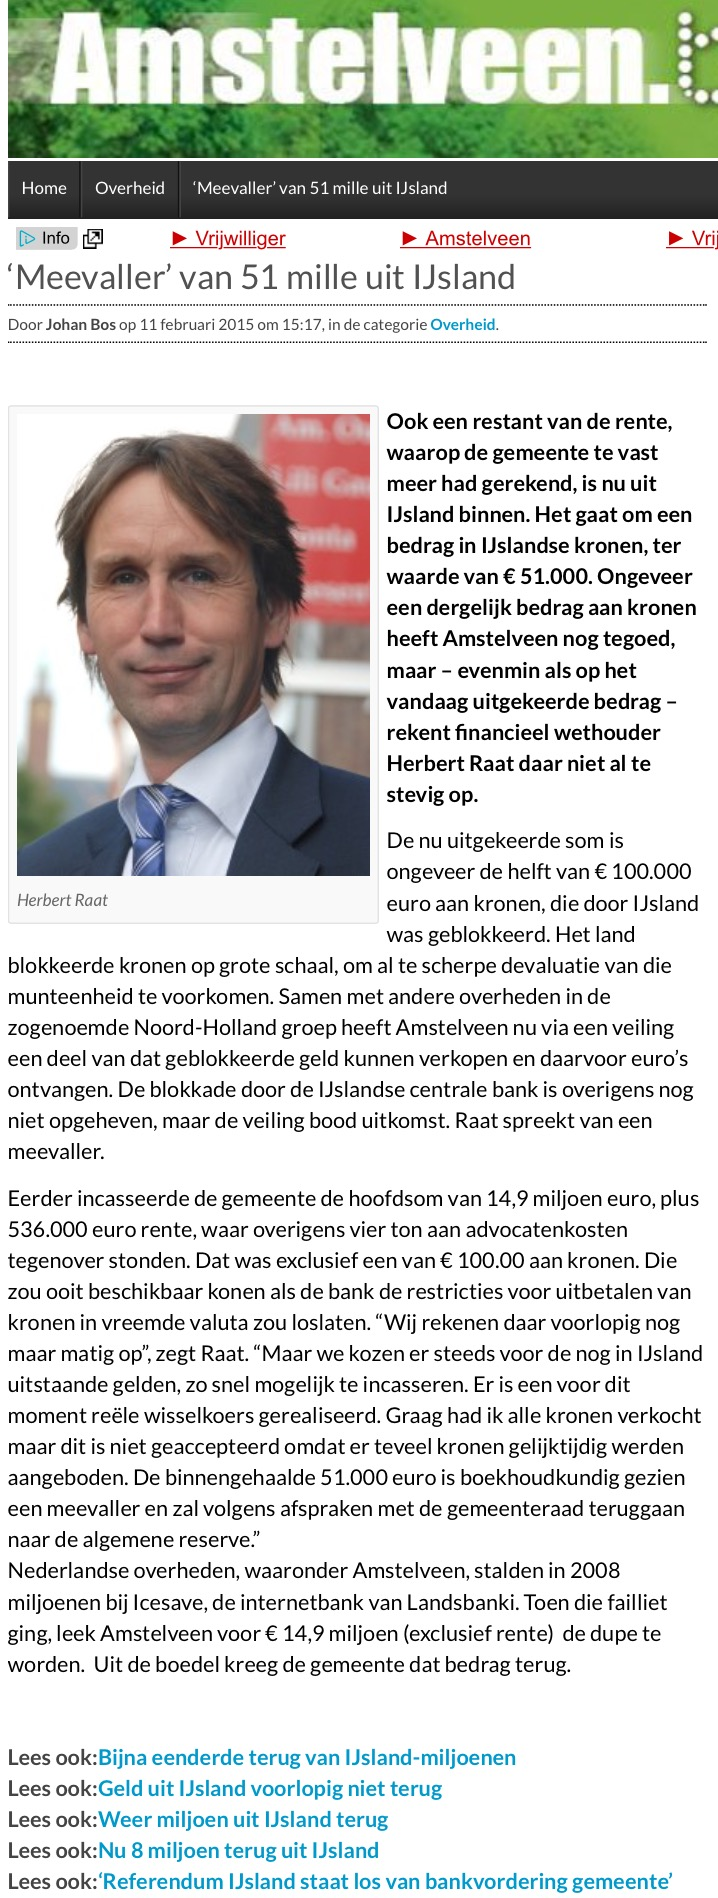 2015-11-2 AmstelveenBlog.nl; Herbert Raat over Landsbanki